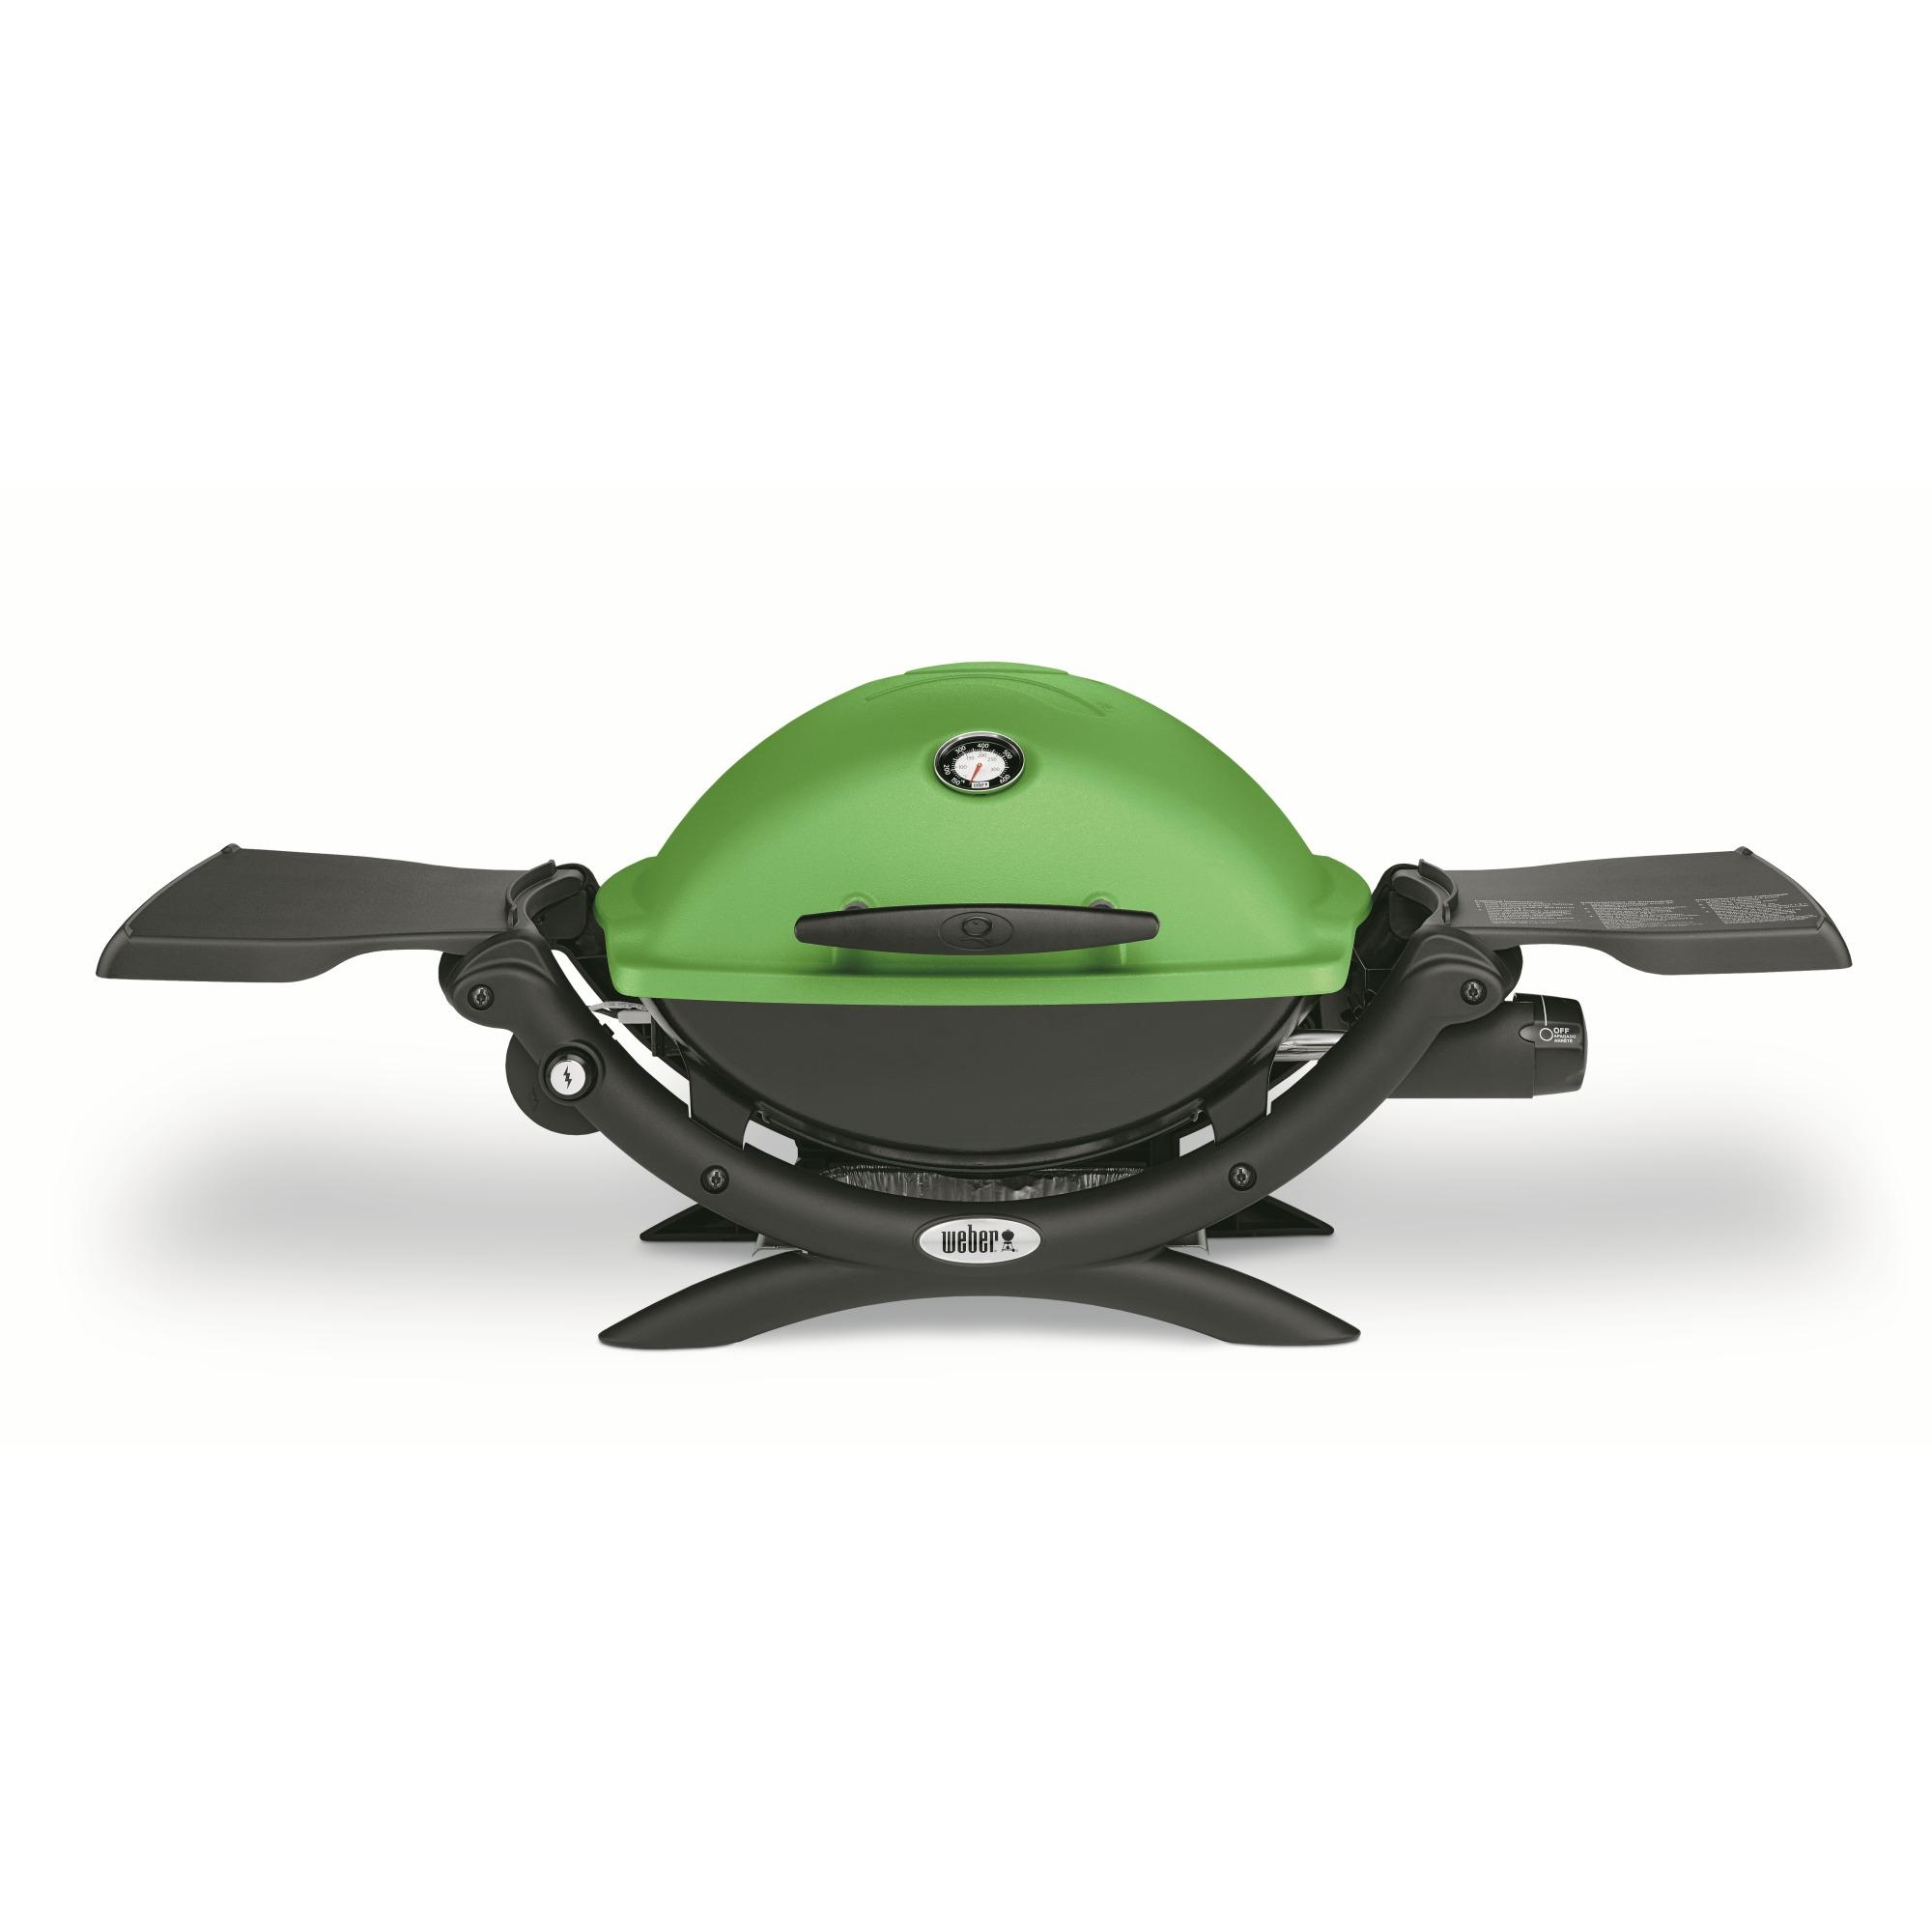 Weber Q1200 Premium gasbarbecue groen